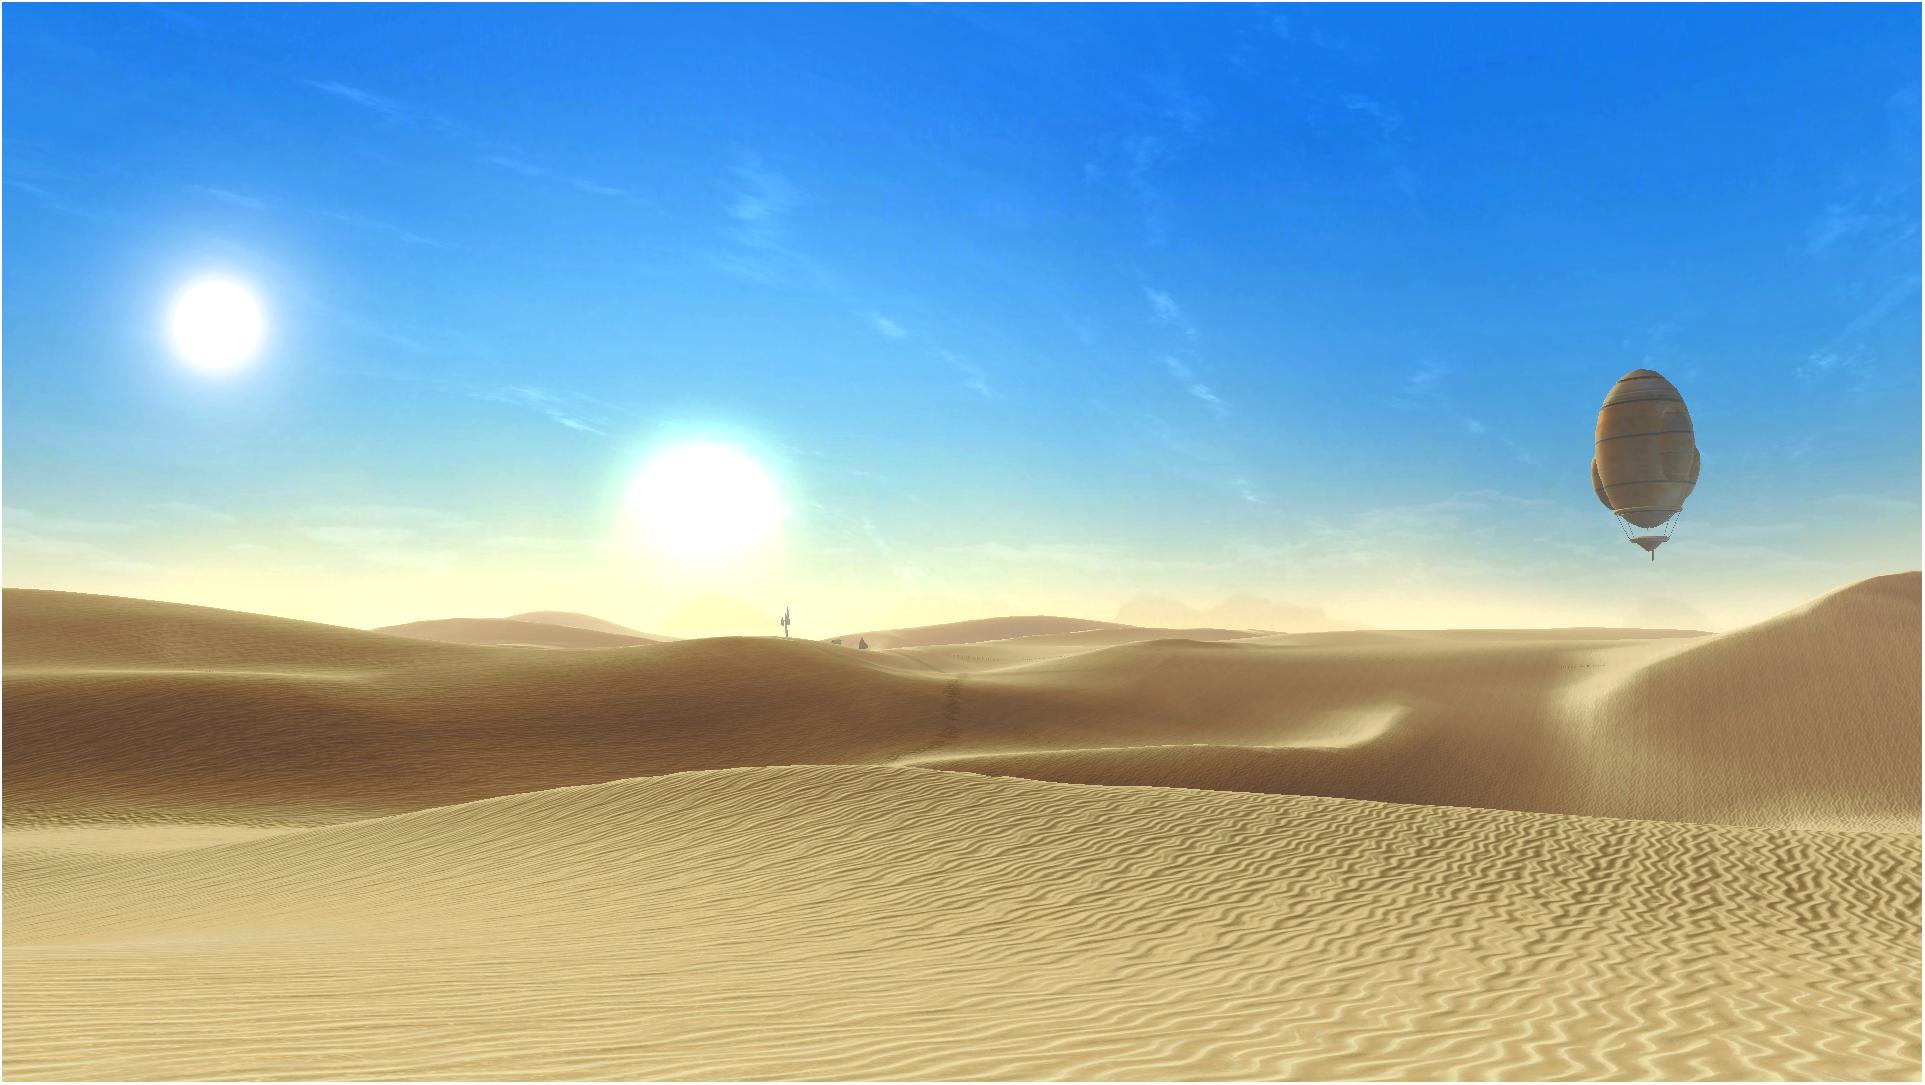 best Star Wars Tatooine images on Pinterest